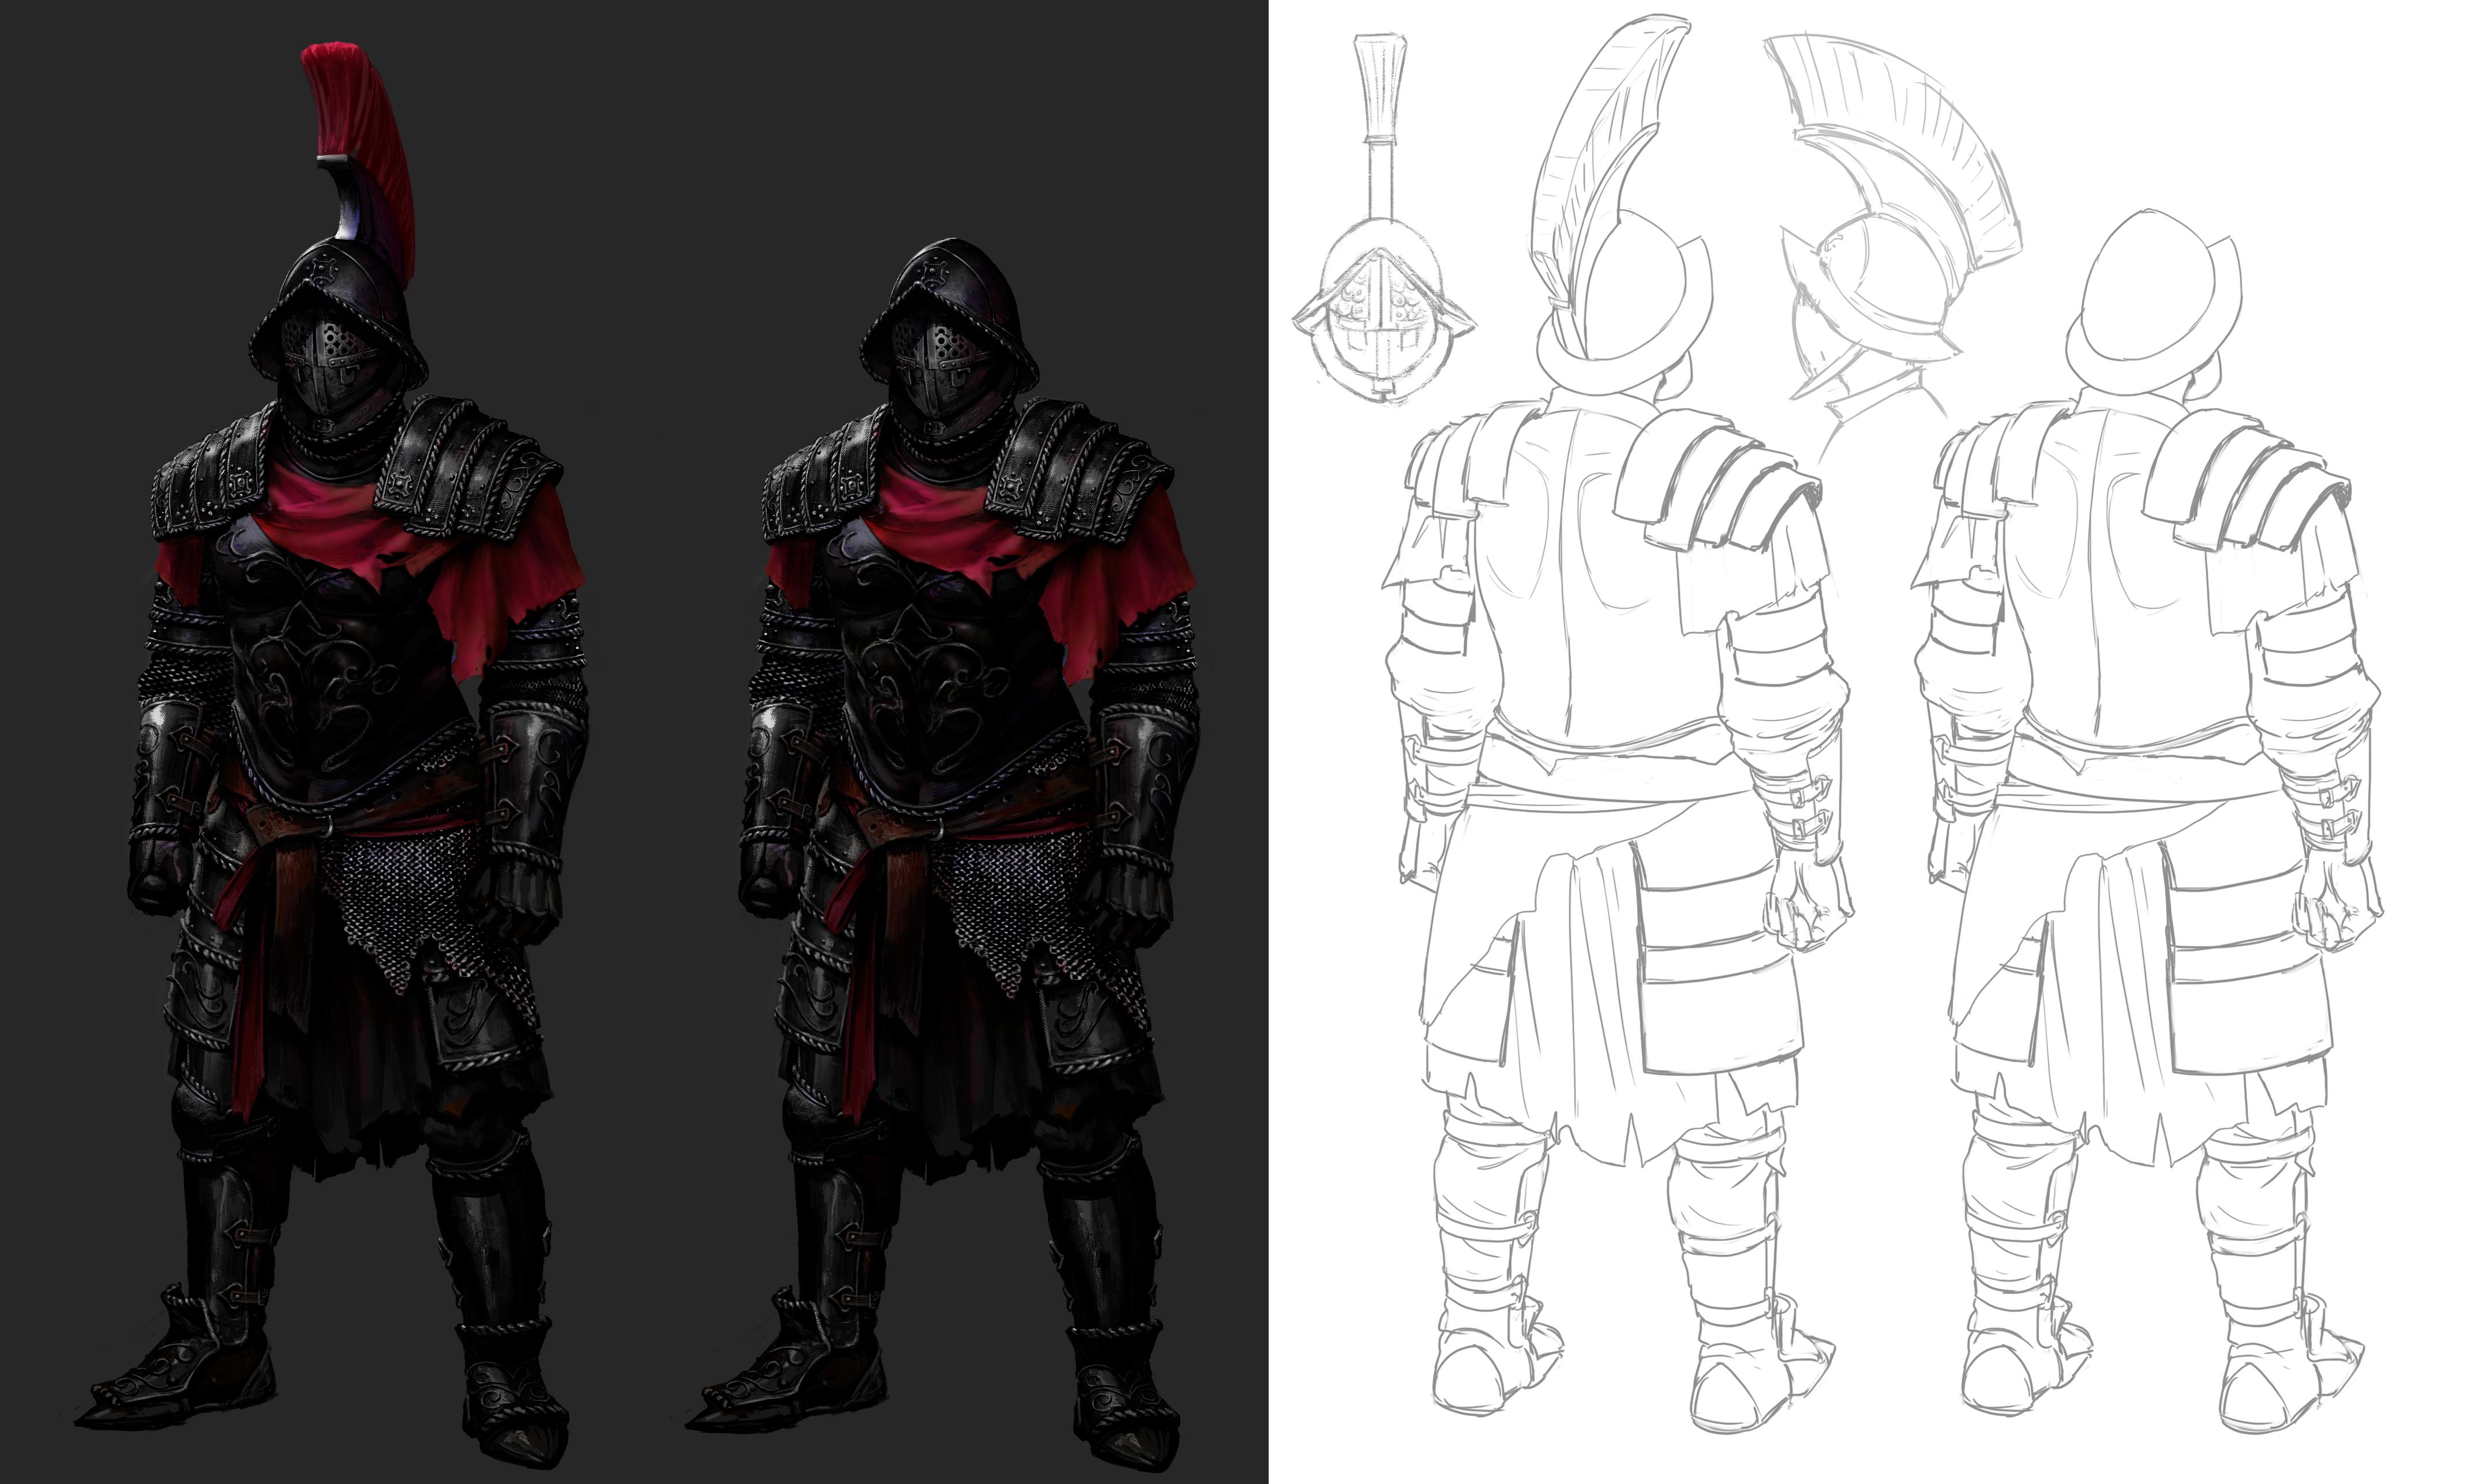 Forum - Announcements - Core Supporter Packs Concept Art - Path of Exile